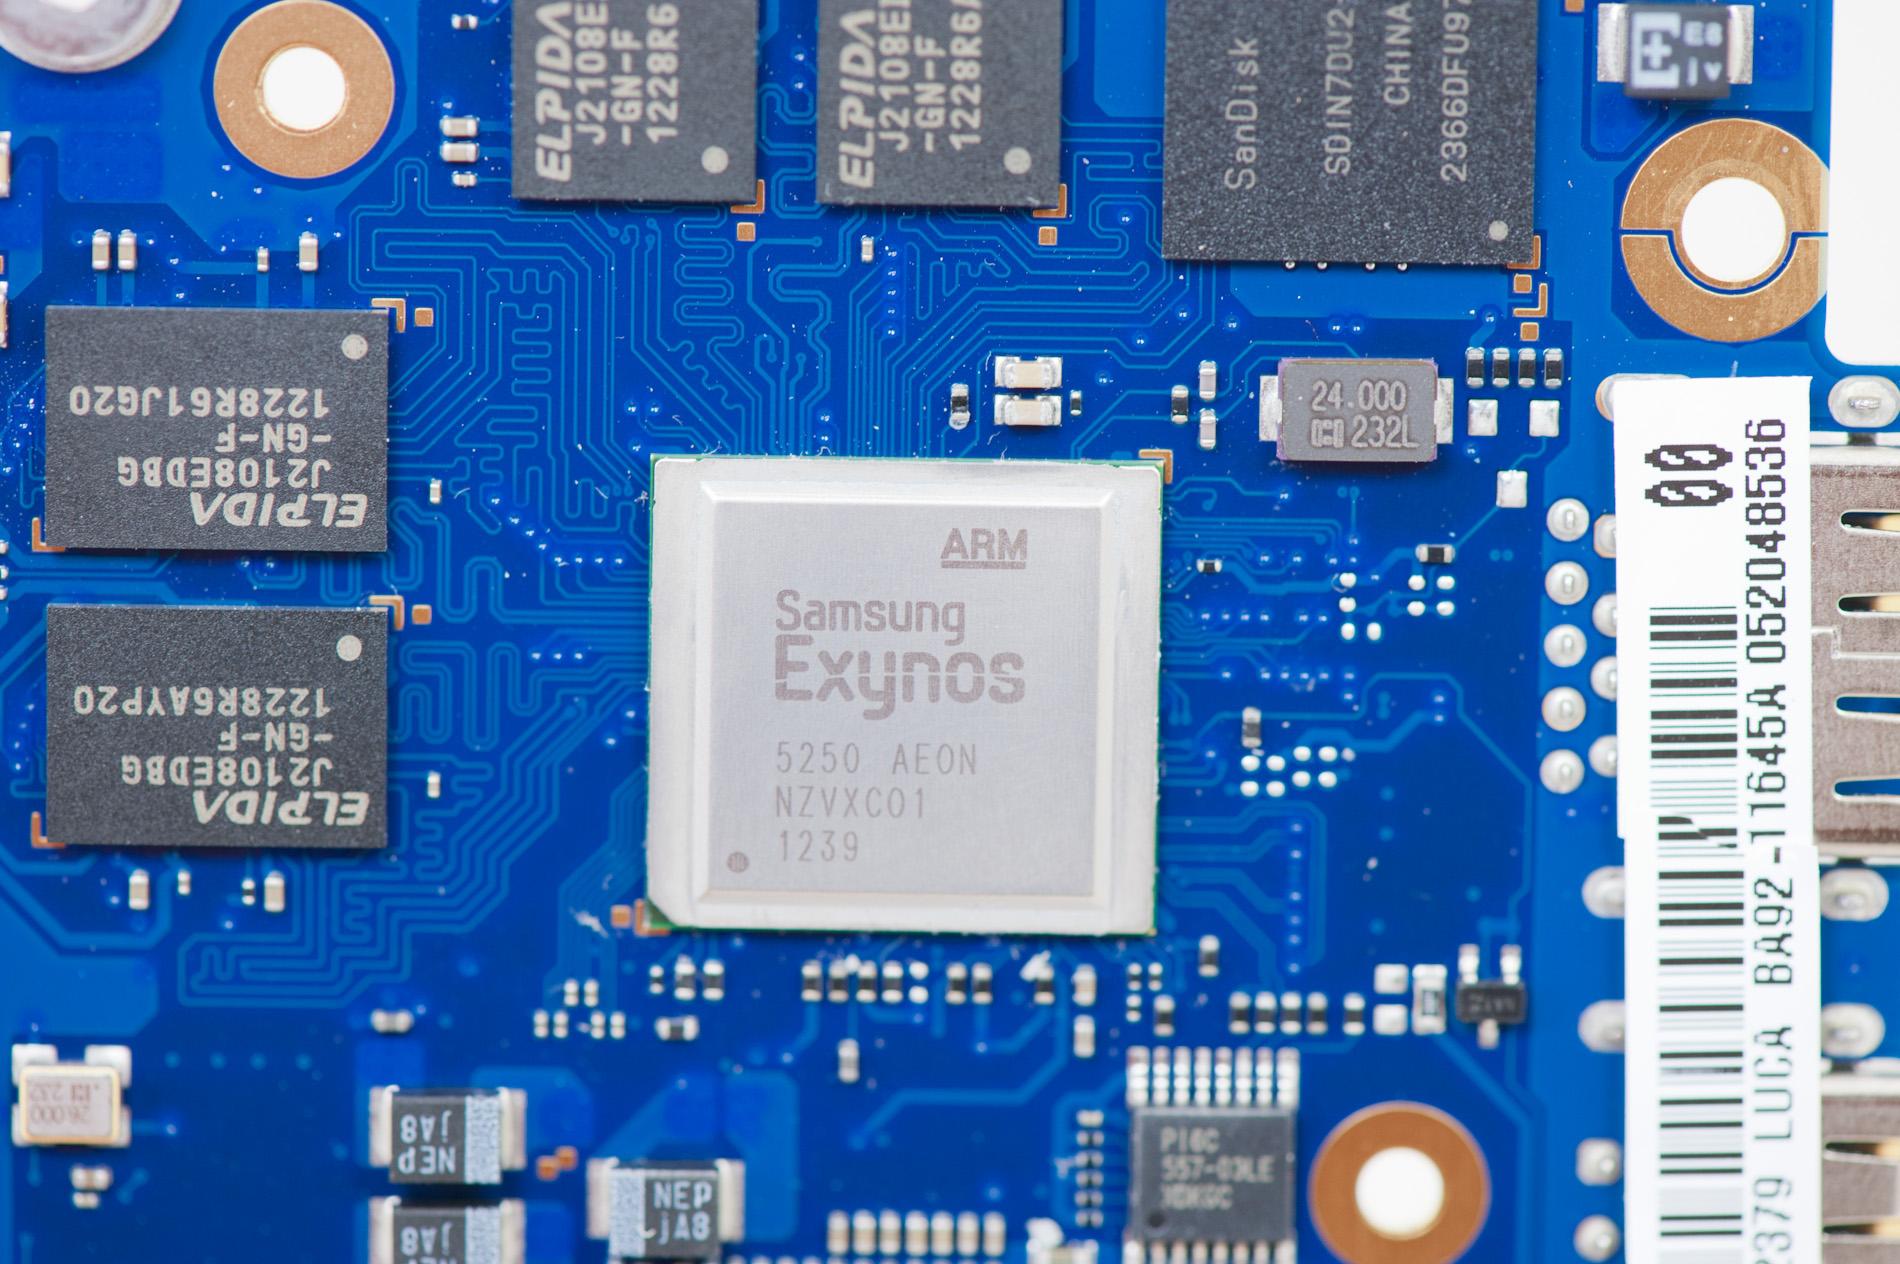 Samsung Chromebook (XE303) Review: Testing ARM's Cortex A15